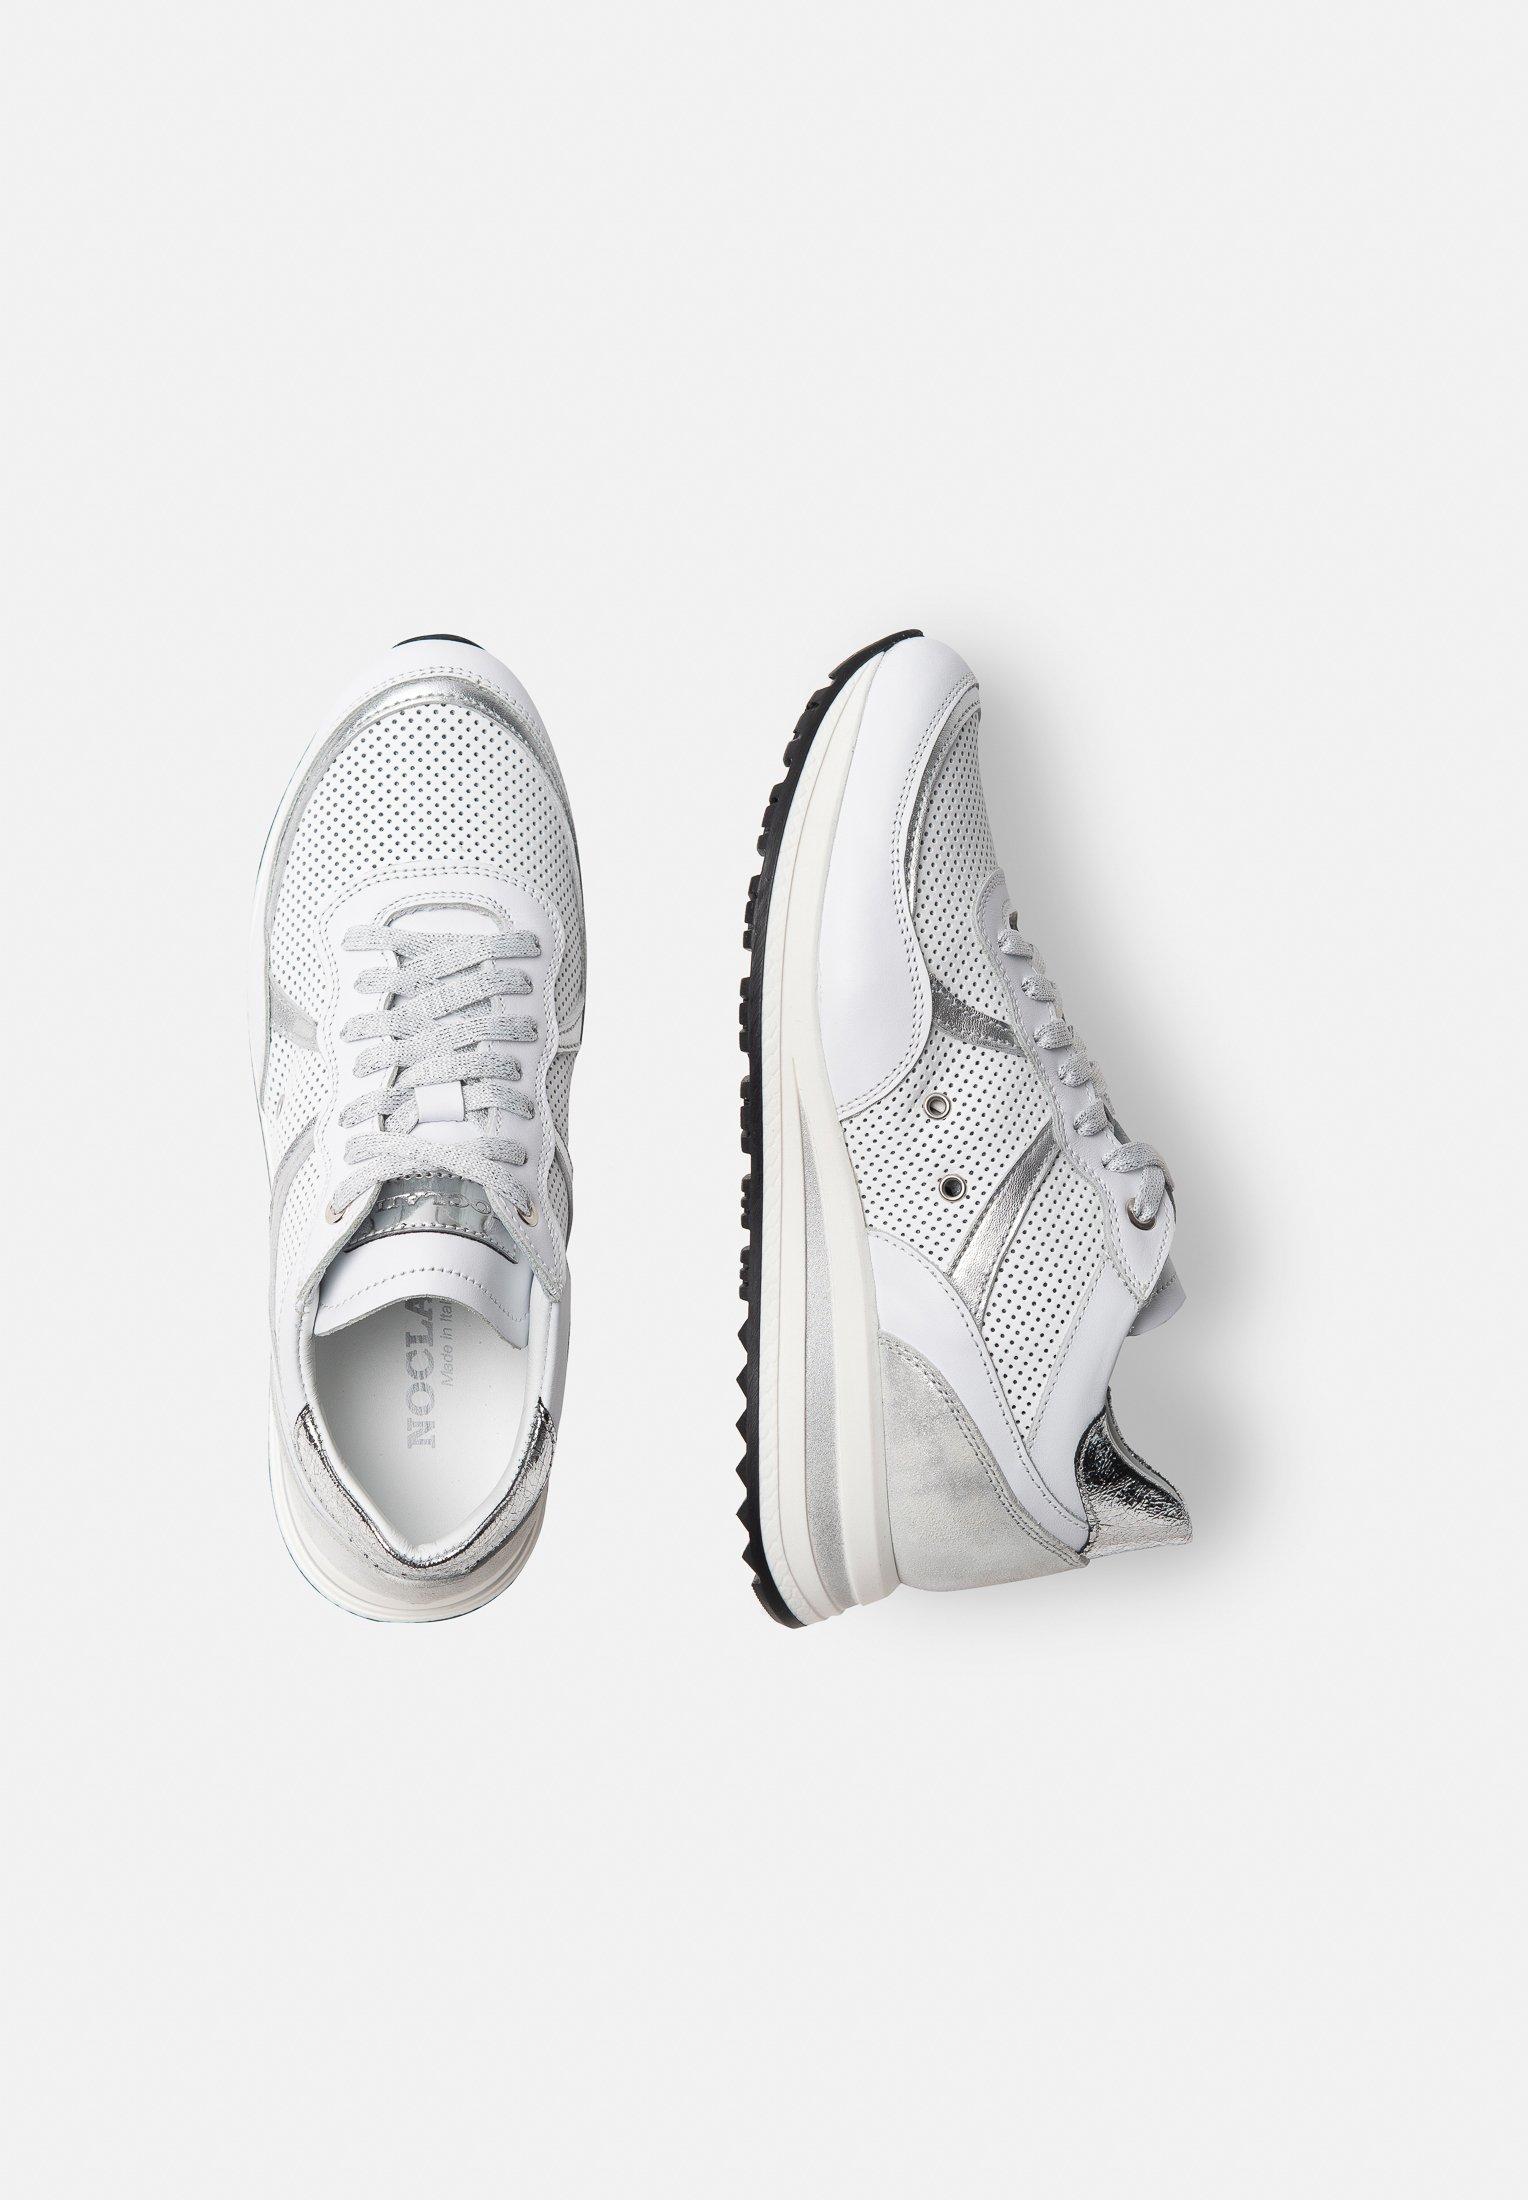 Noclaim NANCY 11A - Sneaker low - argento D41yLT